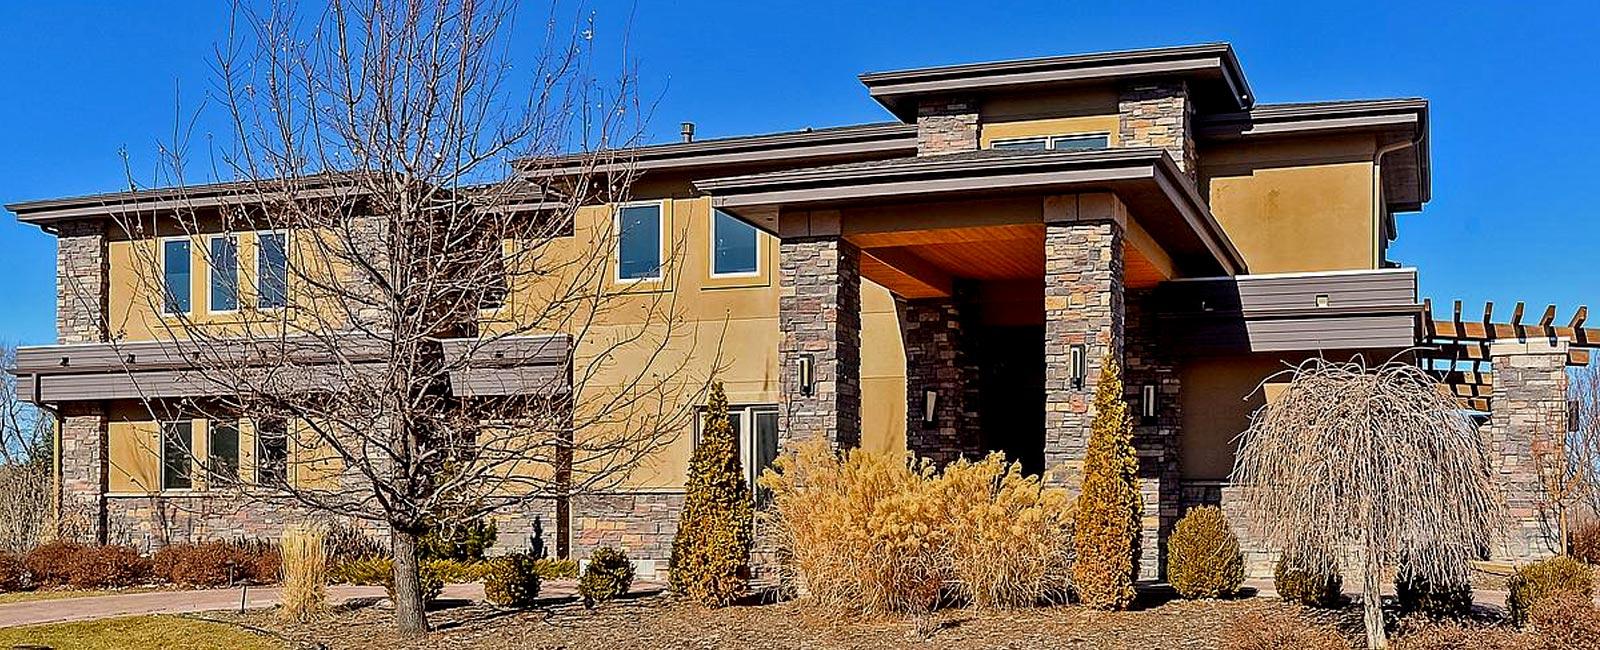 Frank lloyd wright 39 s iconic prairie style architecture - Frank lloyd wright style ...